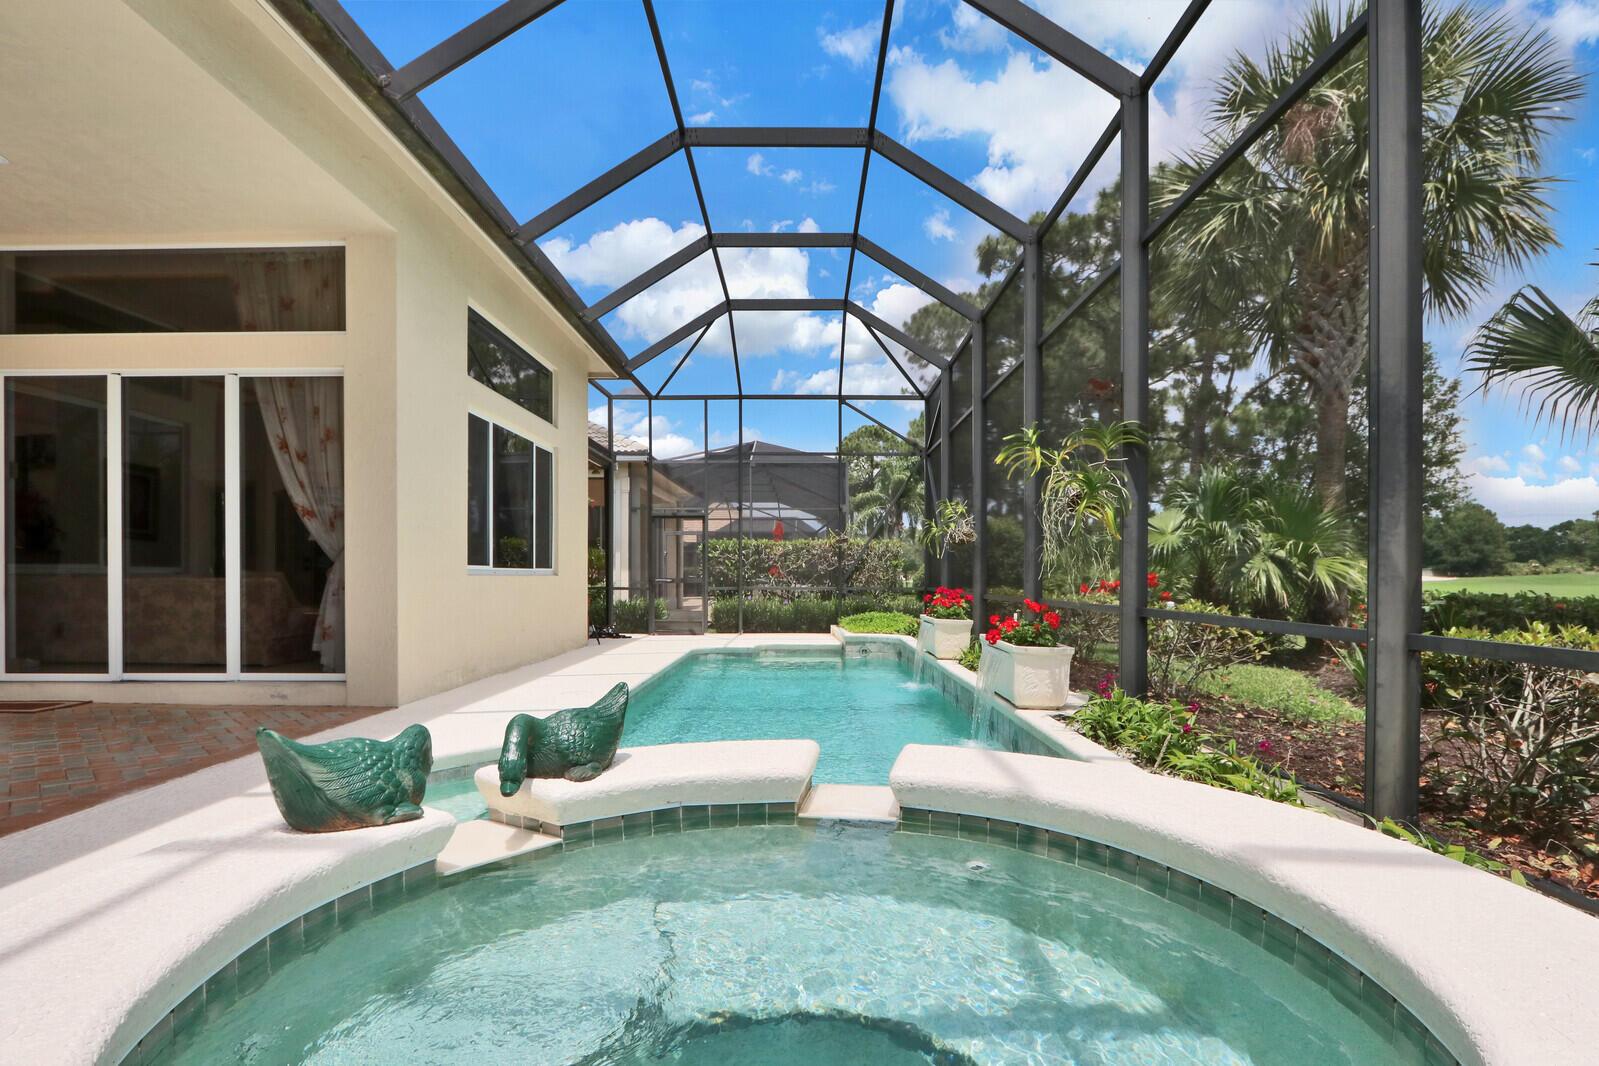 7920 Links Way, Port Saint Lucie, FL 34986